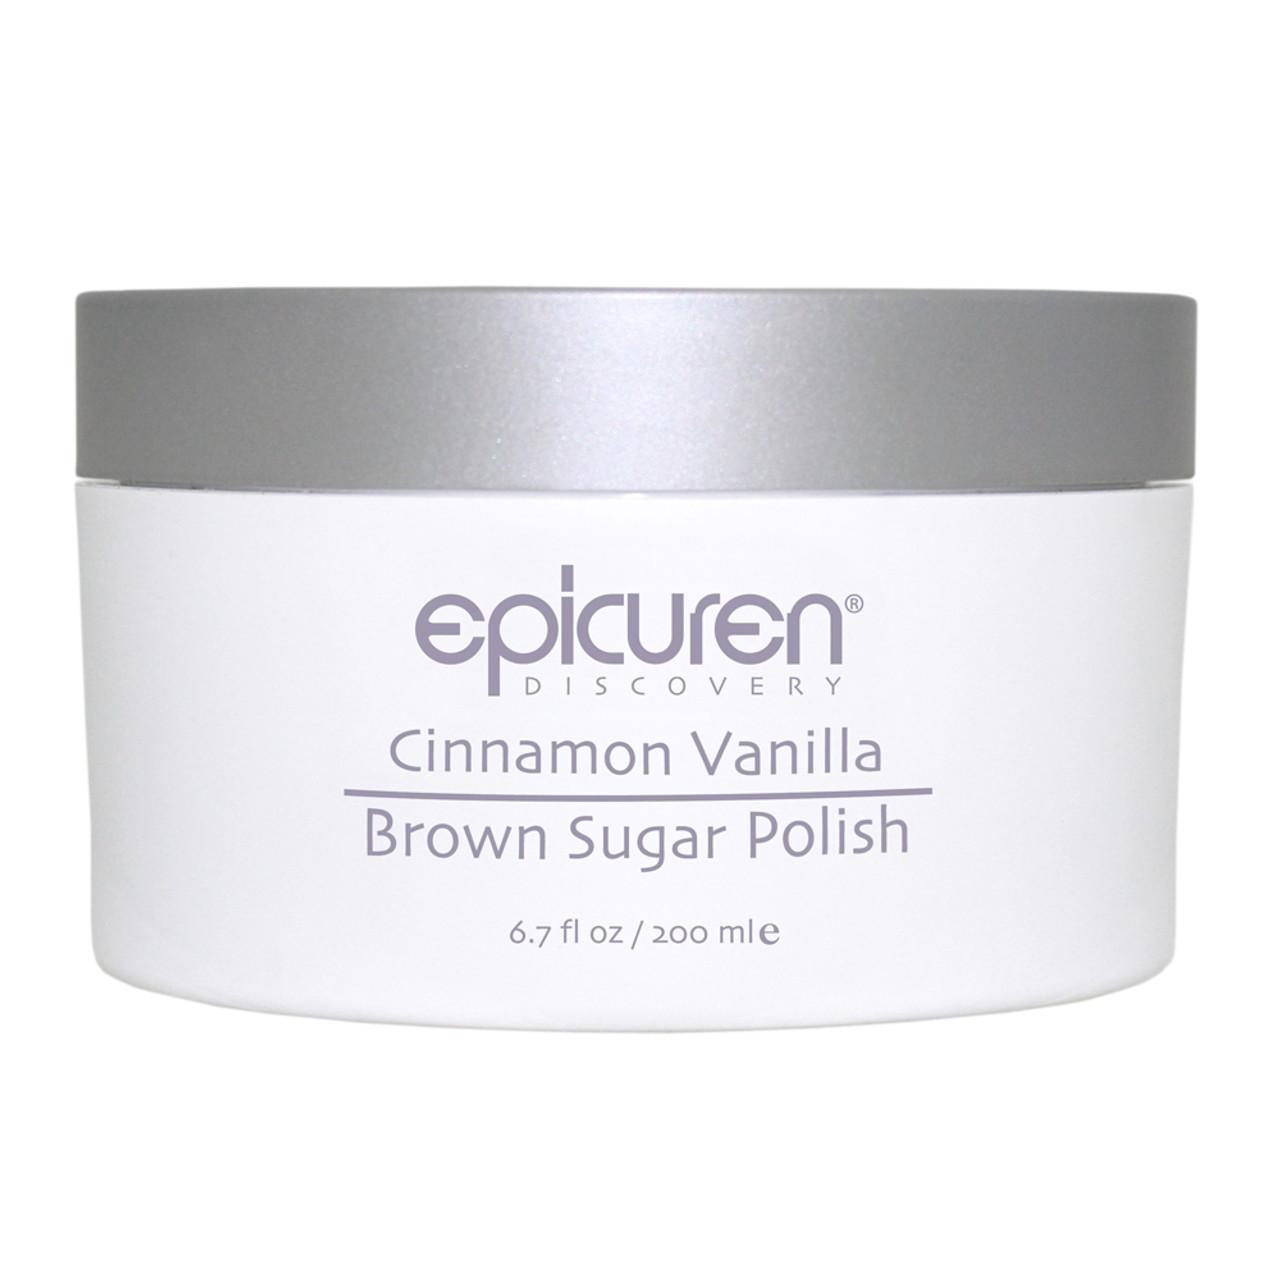 epicuren Discovery Cinnamon Vanilla Brown Sugar Body Polish  BeautifiedYou.com